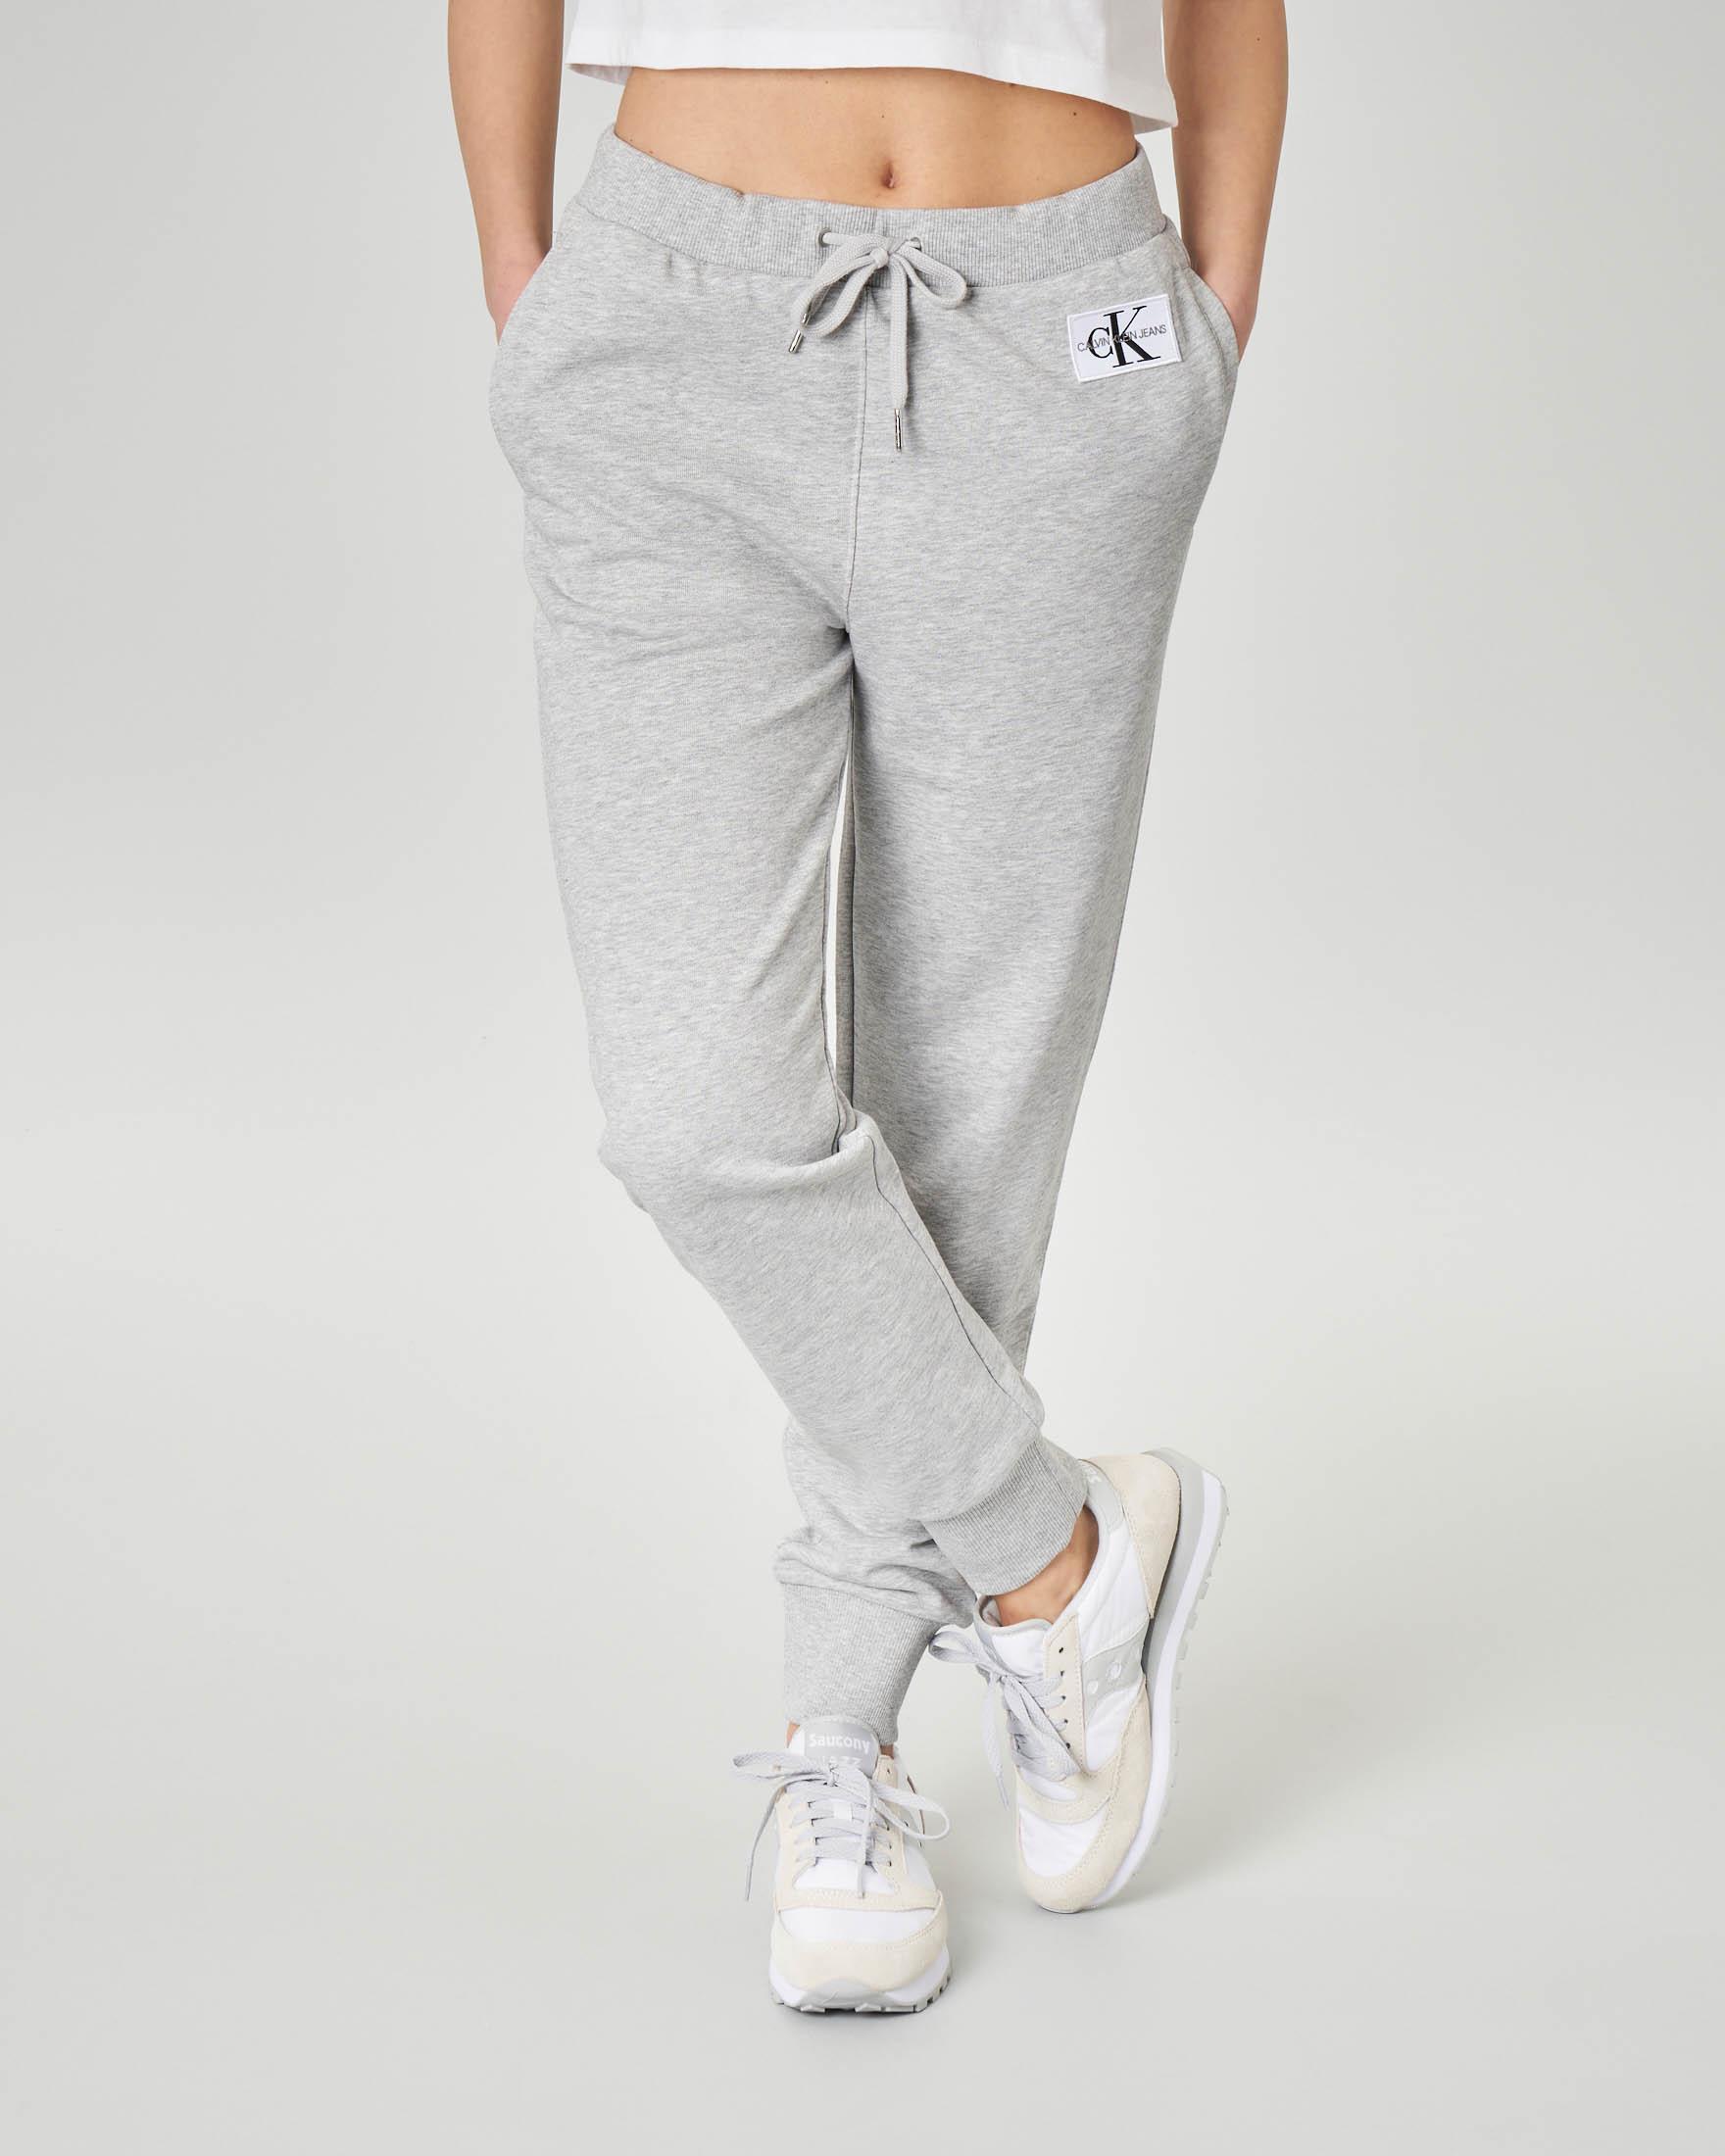 Pantaloni in felpa grigi con polsini a costine